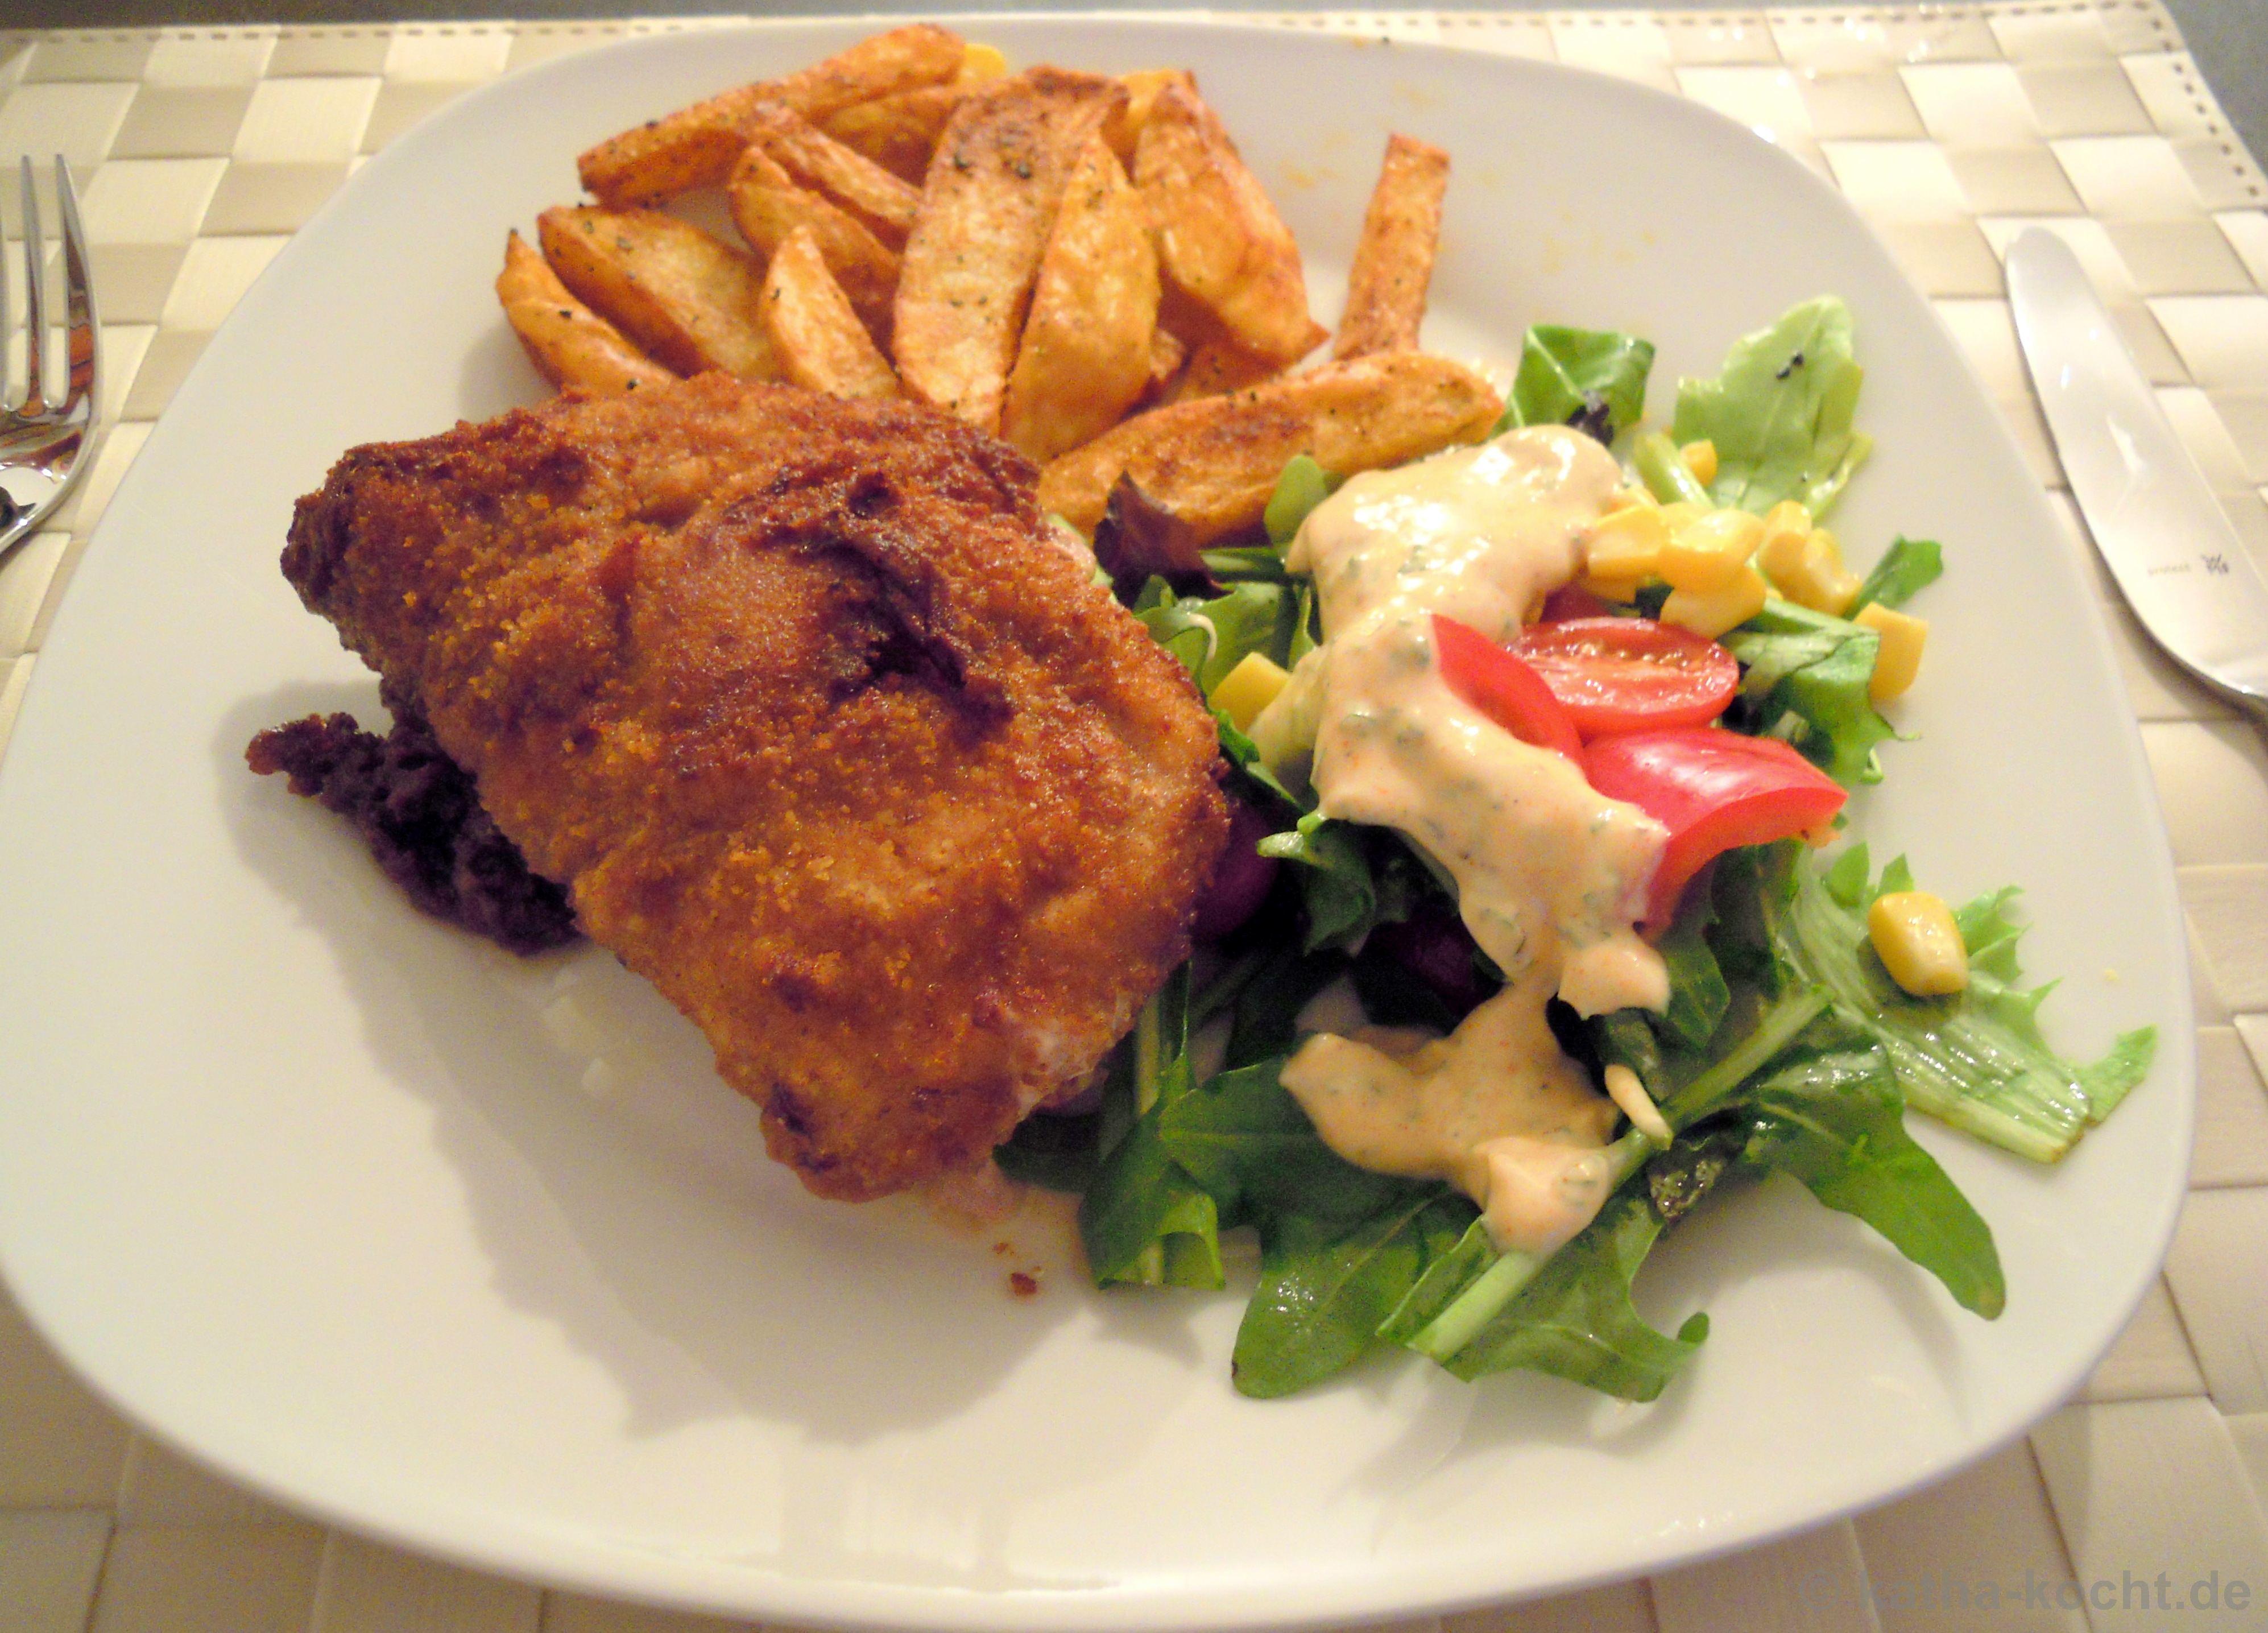 Selbstgemachtes Cordon Bleu Mit Pommes Und Salat Katha Kocht